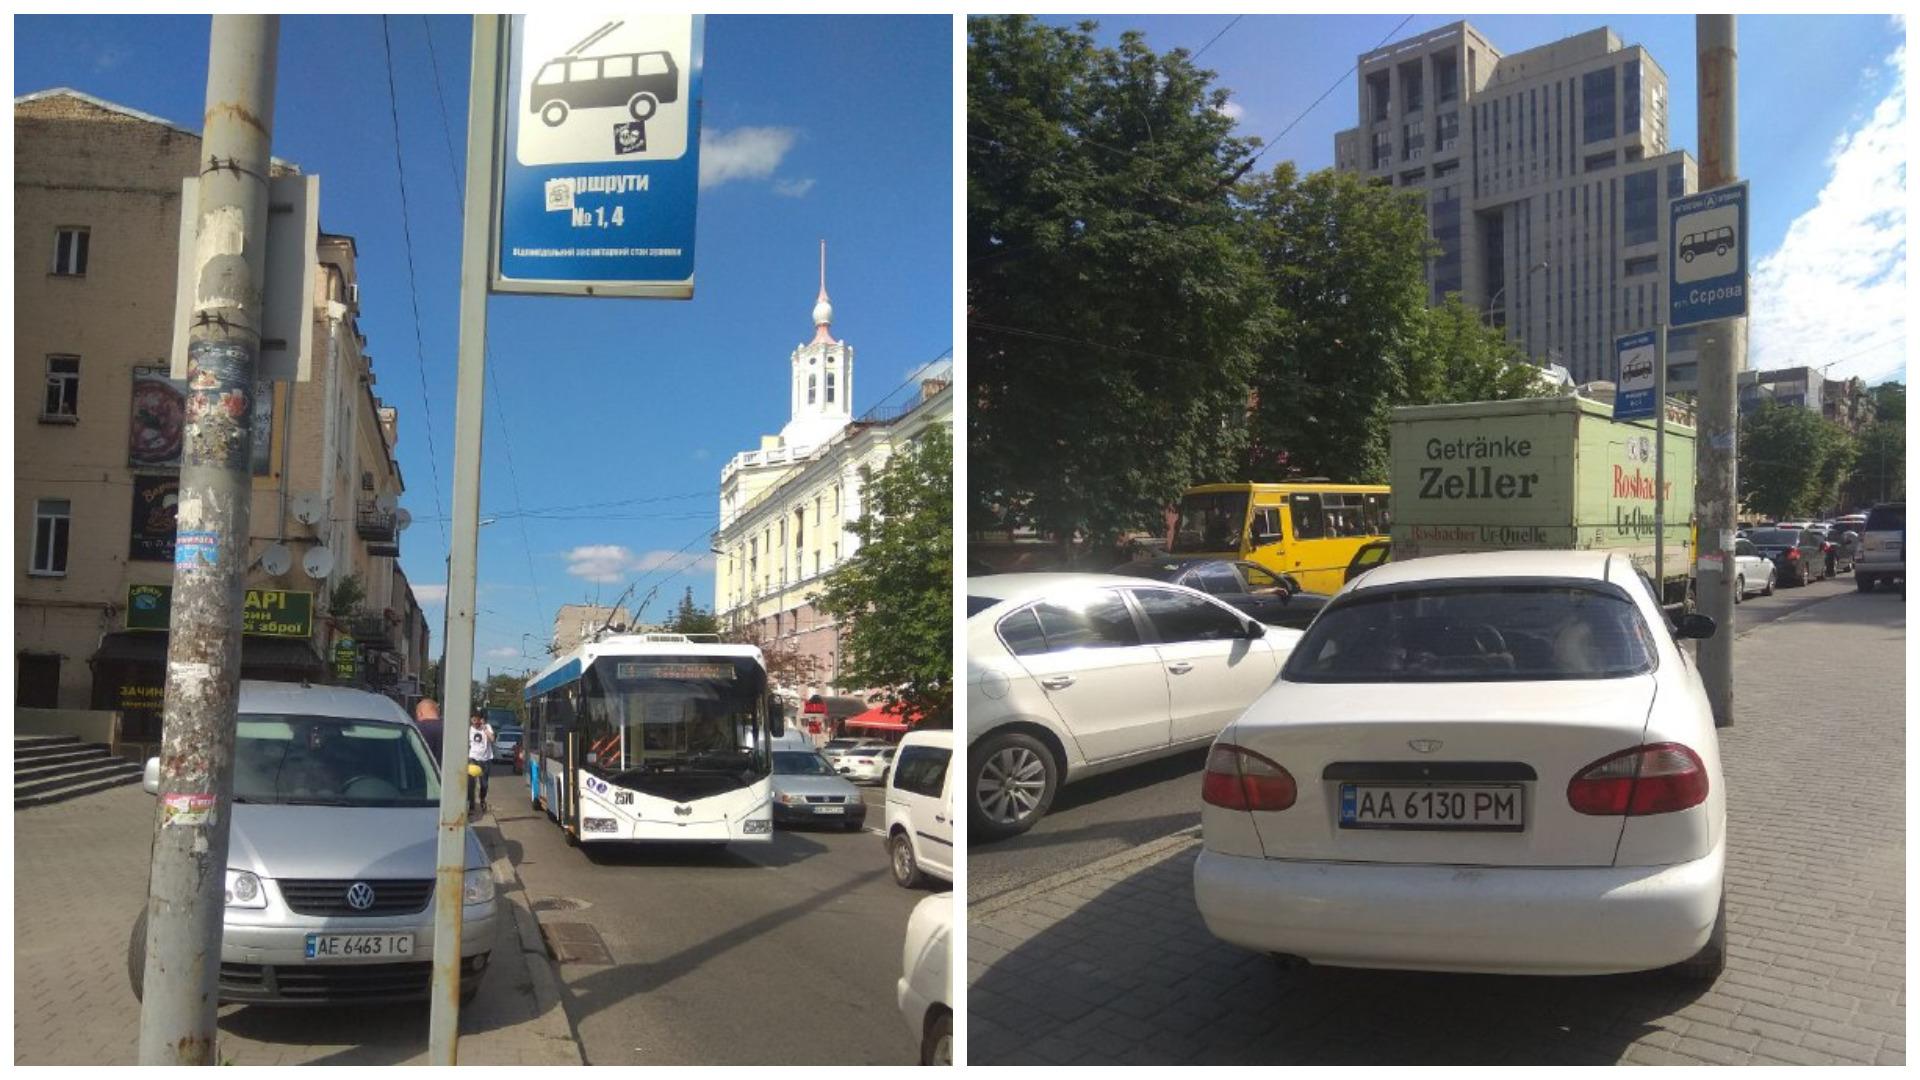 Volkswagen Caddy с номером АЕ 6463 ІС и Daewoo Lanos с номером АА 6130 РМ